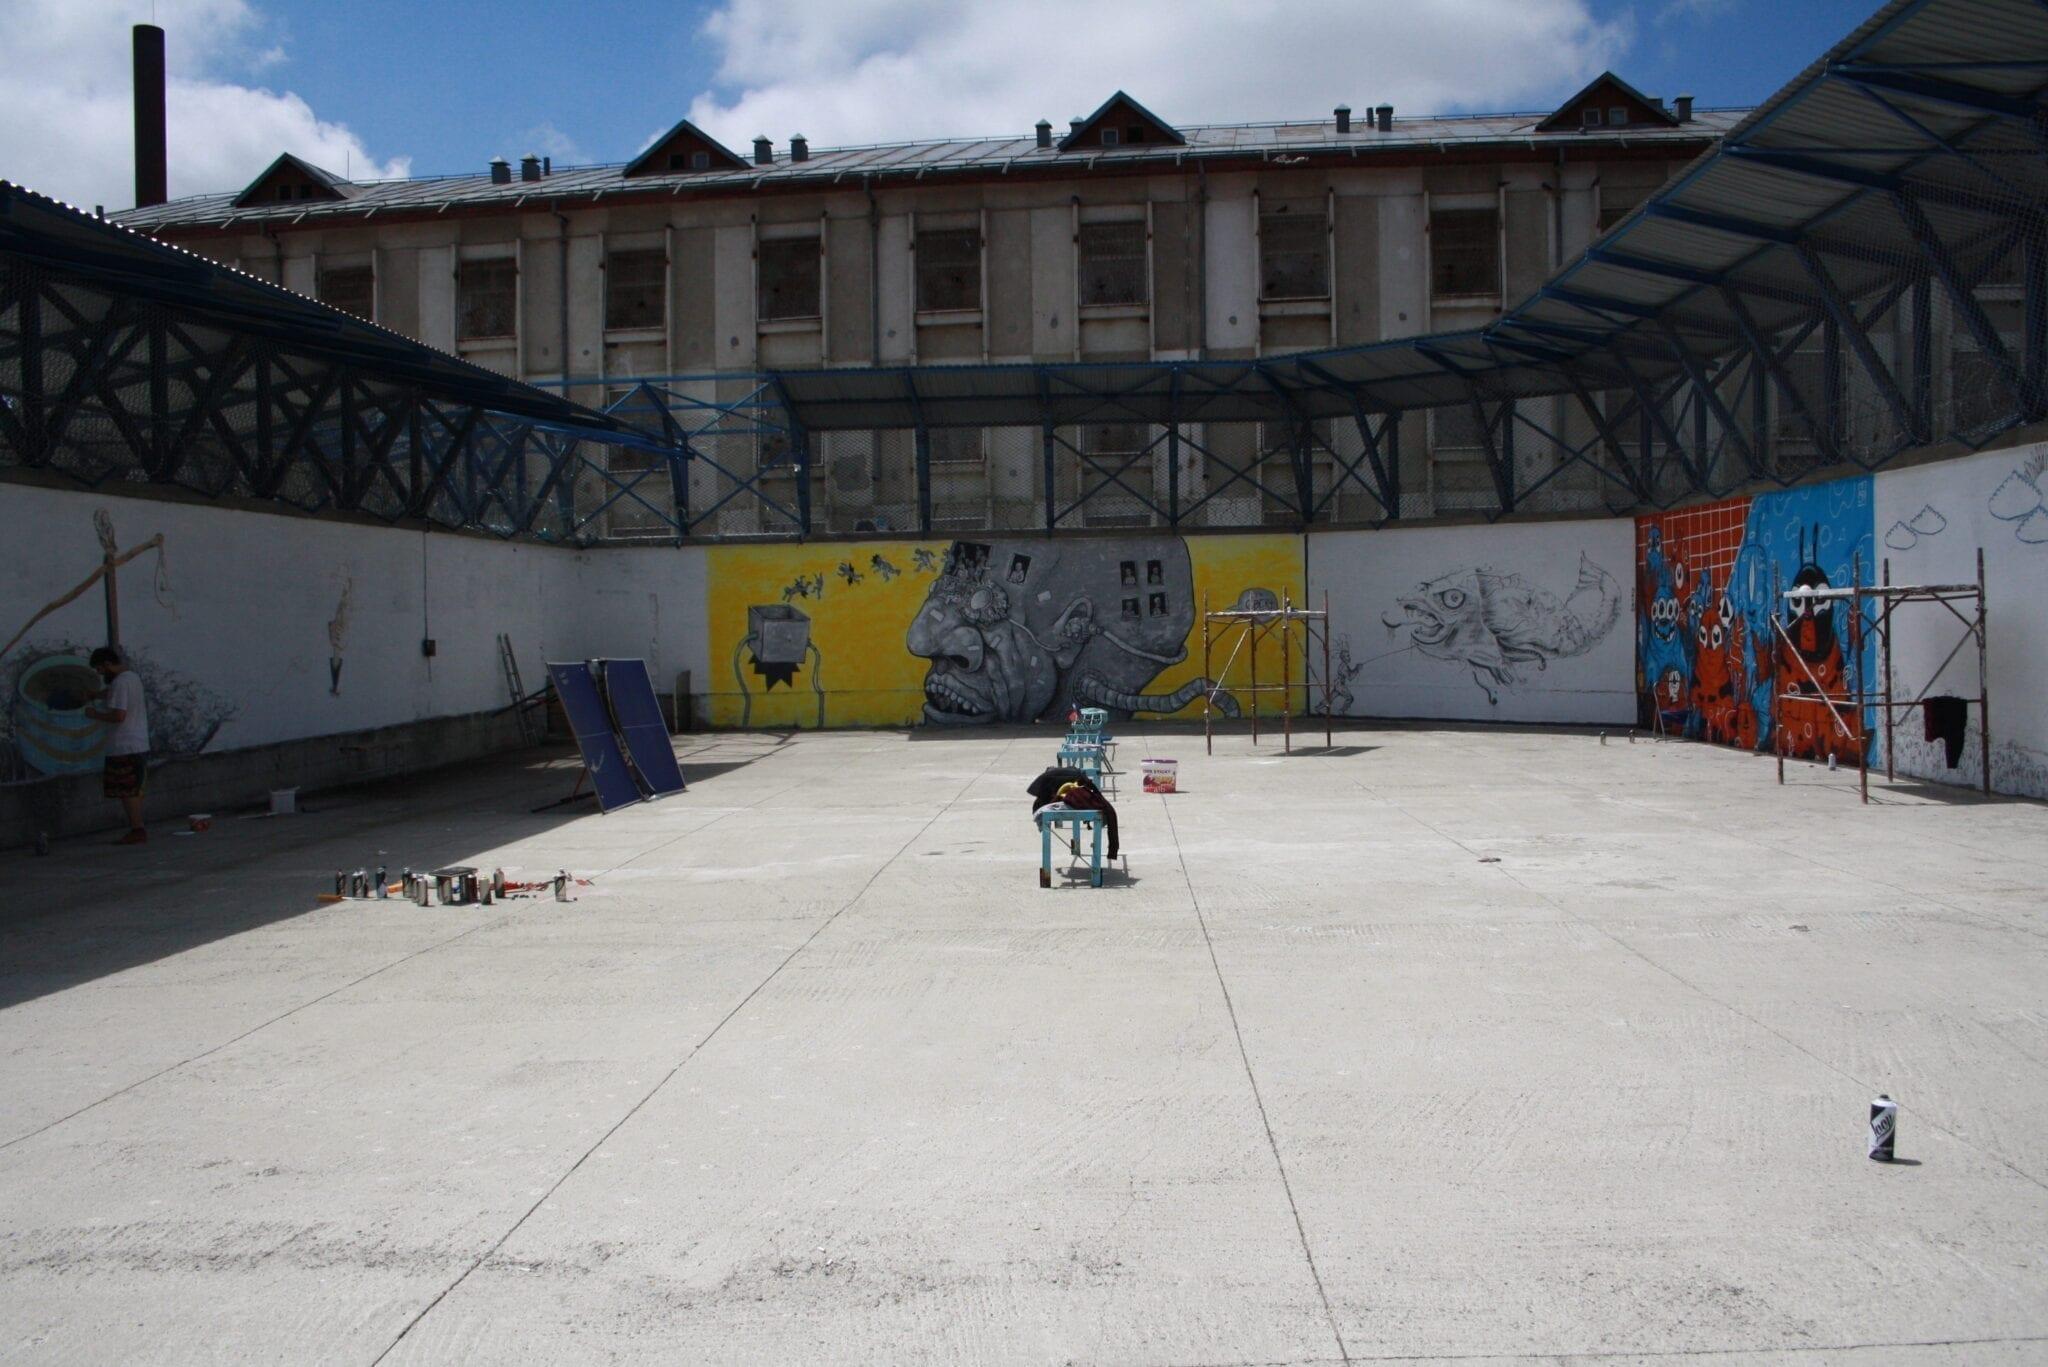 Robert Obert Street Delivery penitenciarul Iași 2018 Street Delivery penitenciarul Iași 2018 Un-hidden street art in Romania book art files